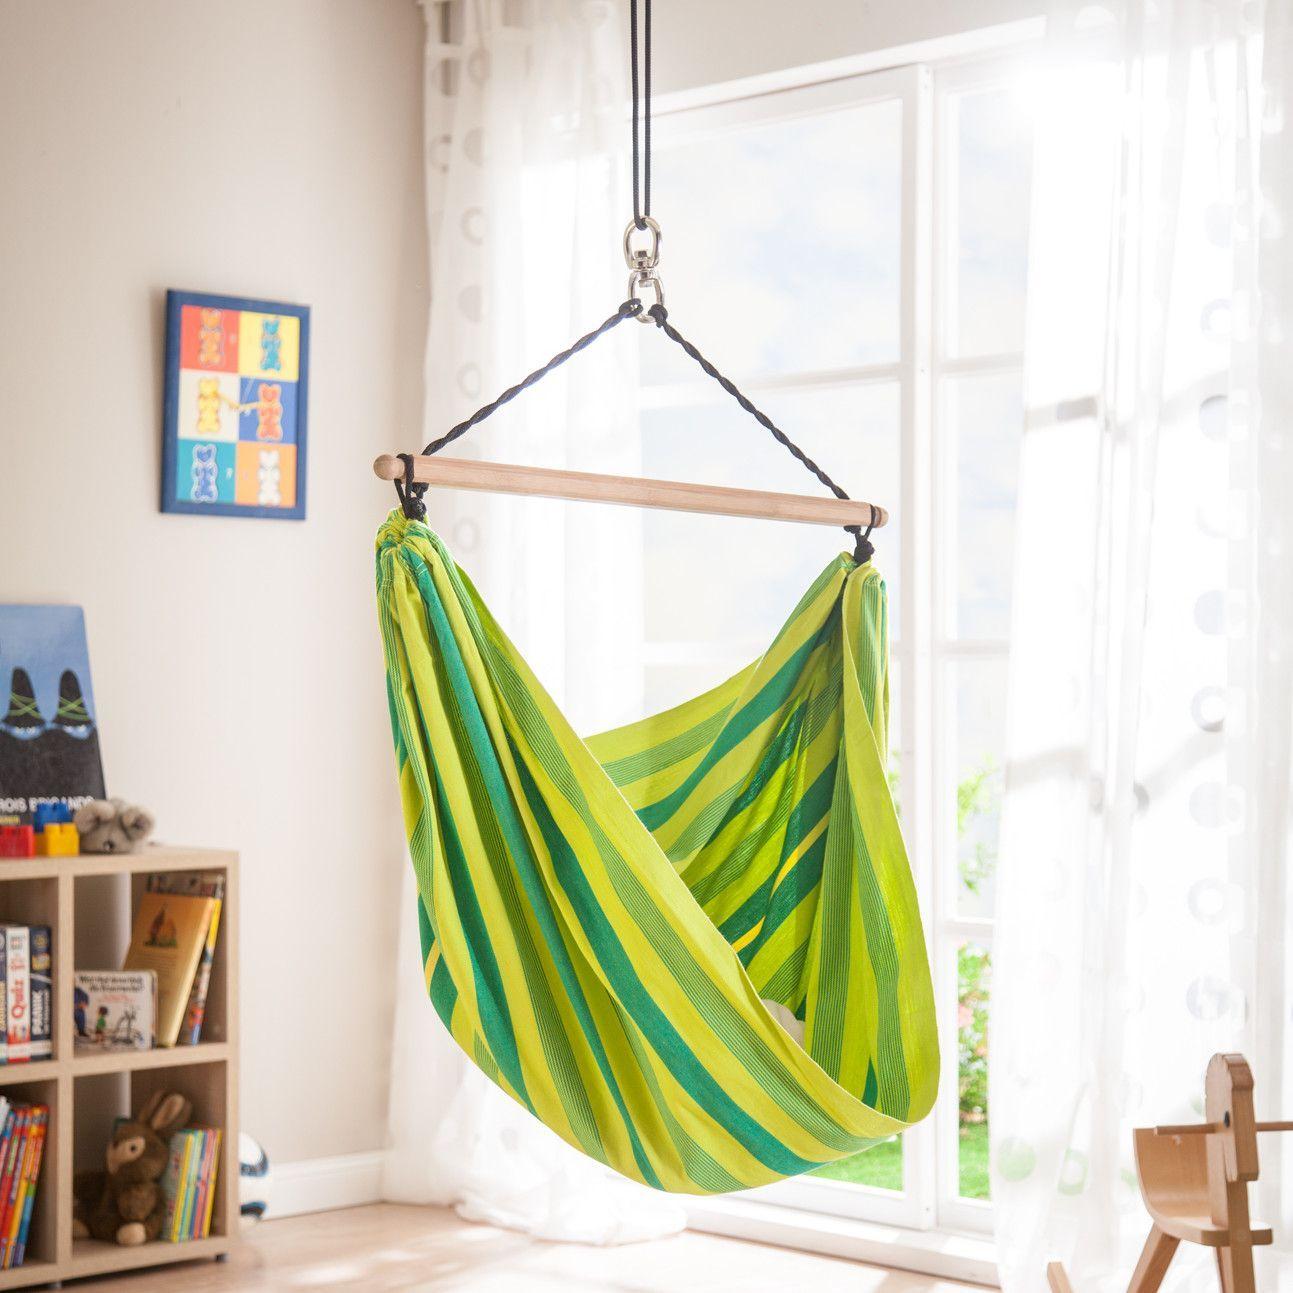 Lori organic hammock chair for kids balanço in pinterest